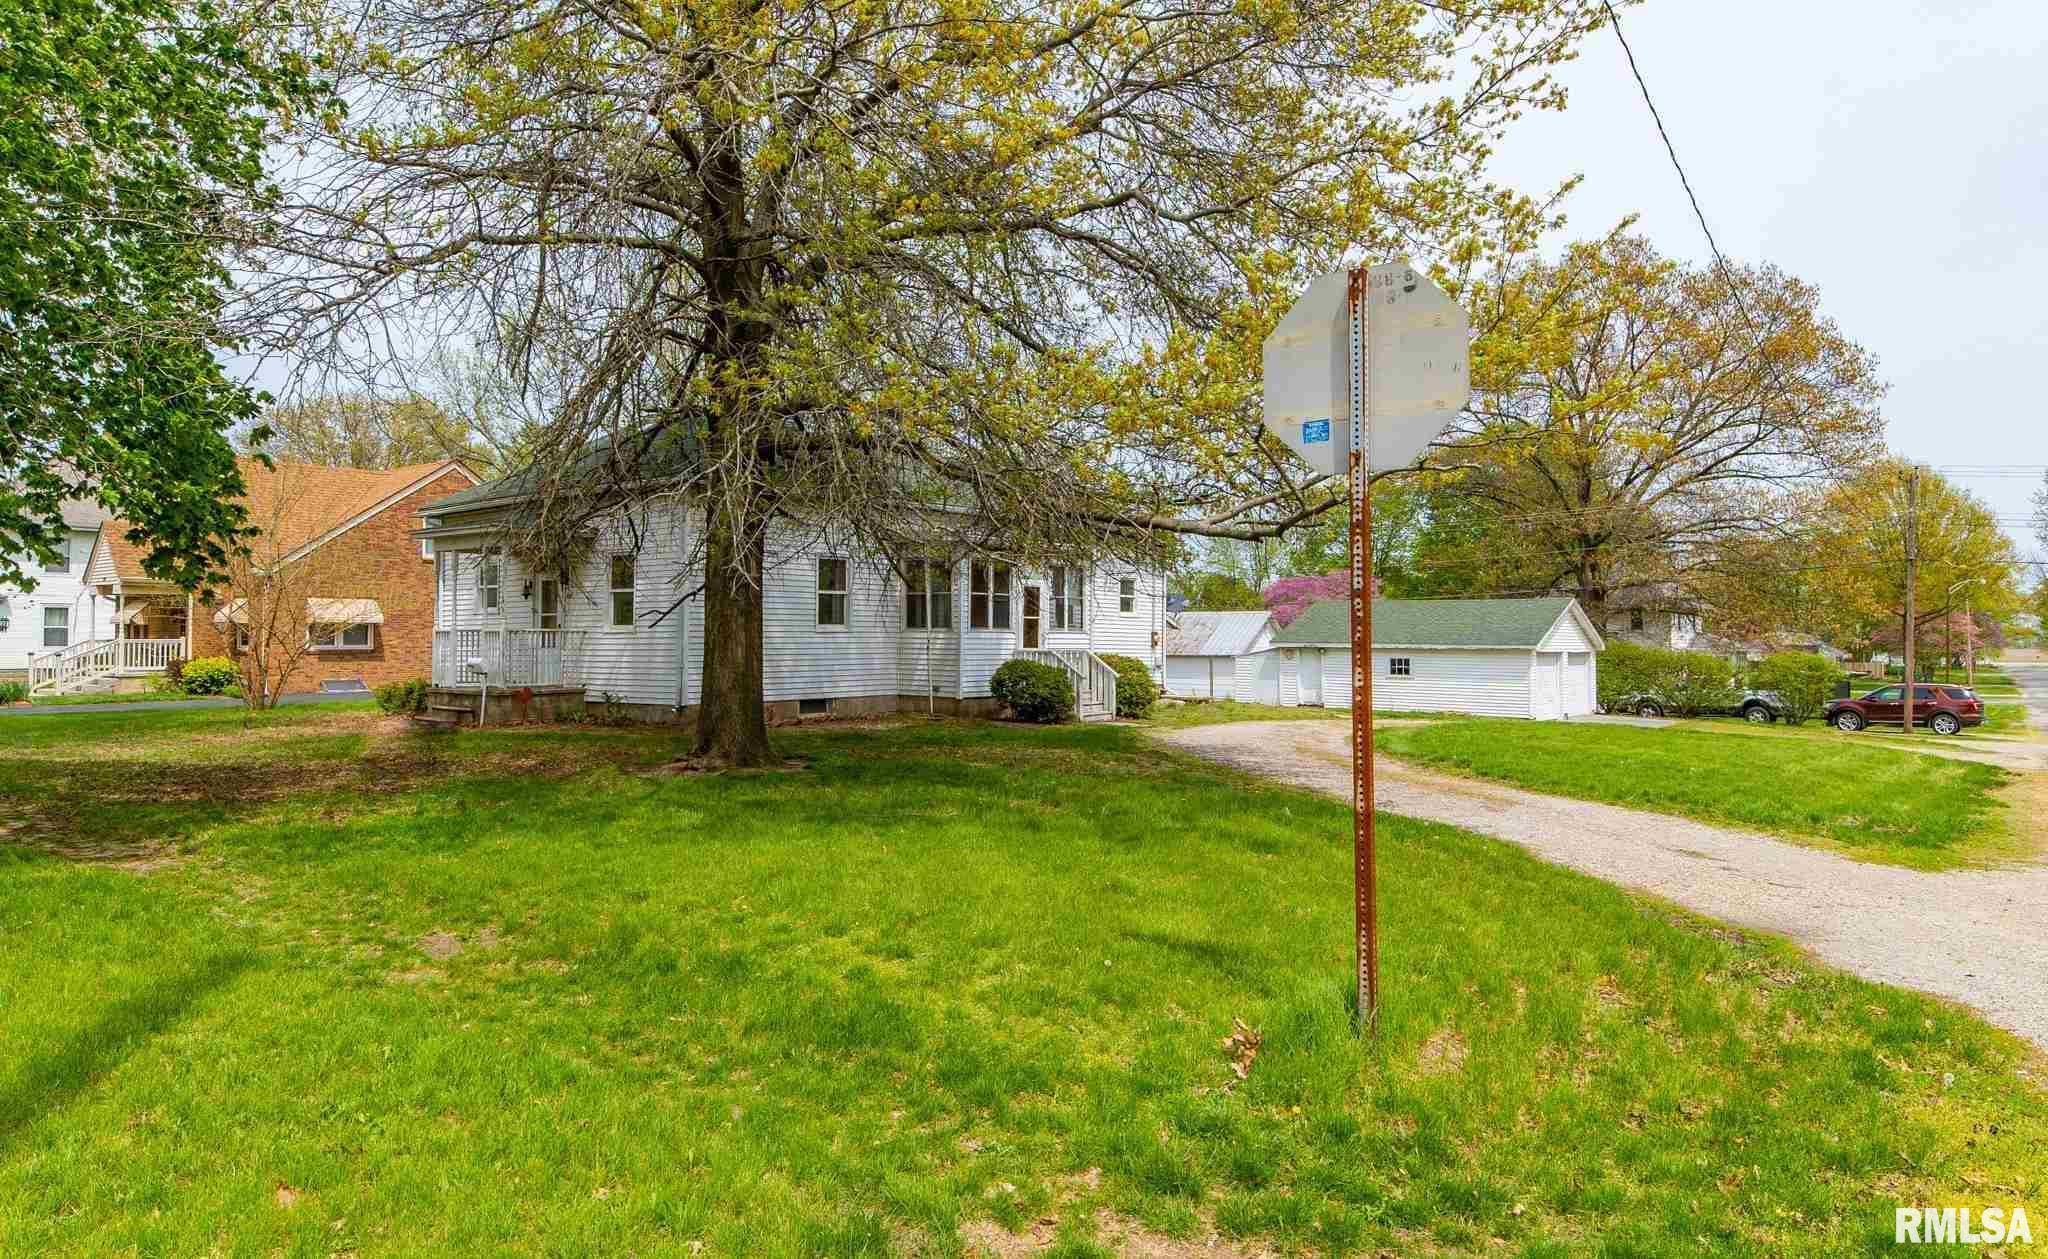 503 N VINE Property Photo - Mt Pulaski, IL real estate listing